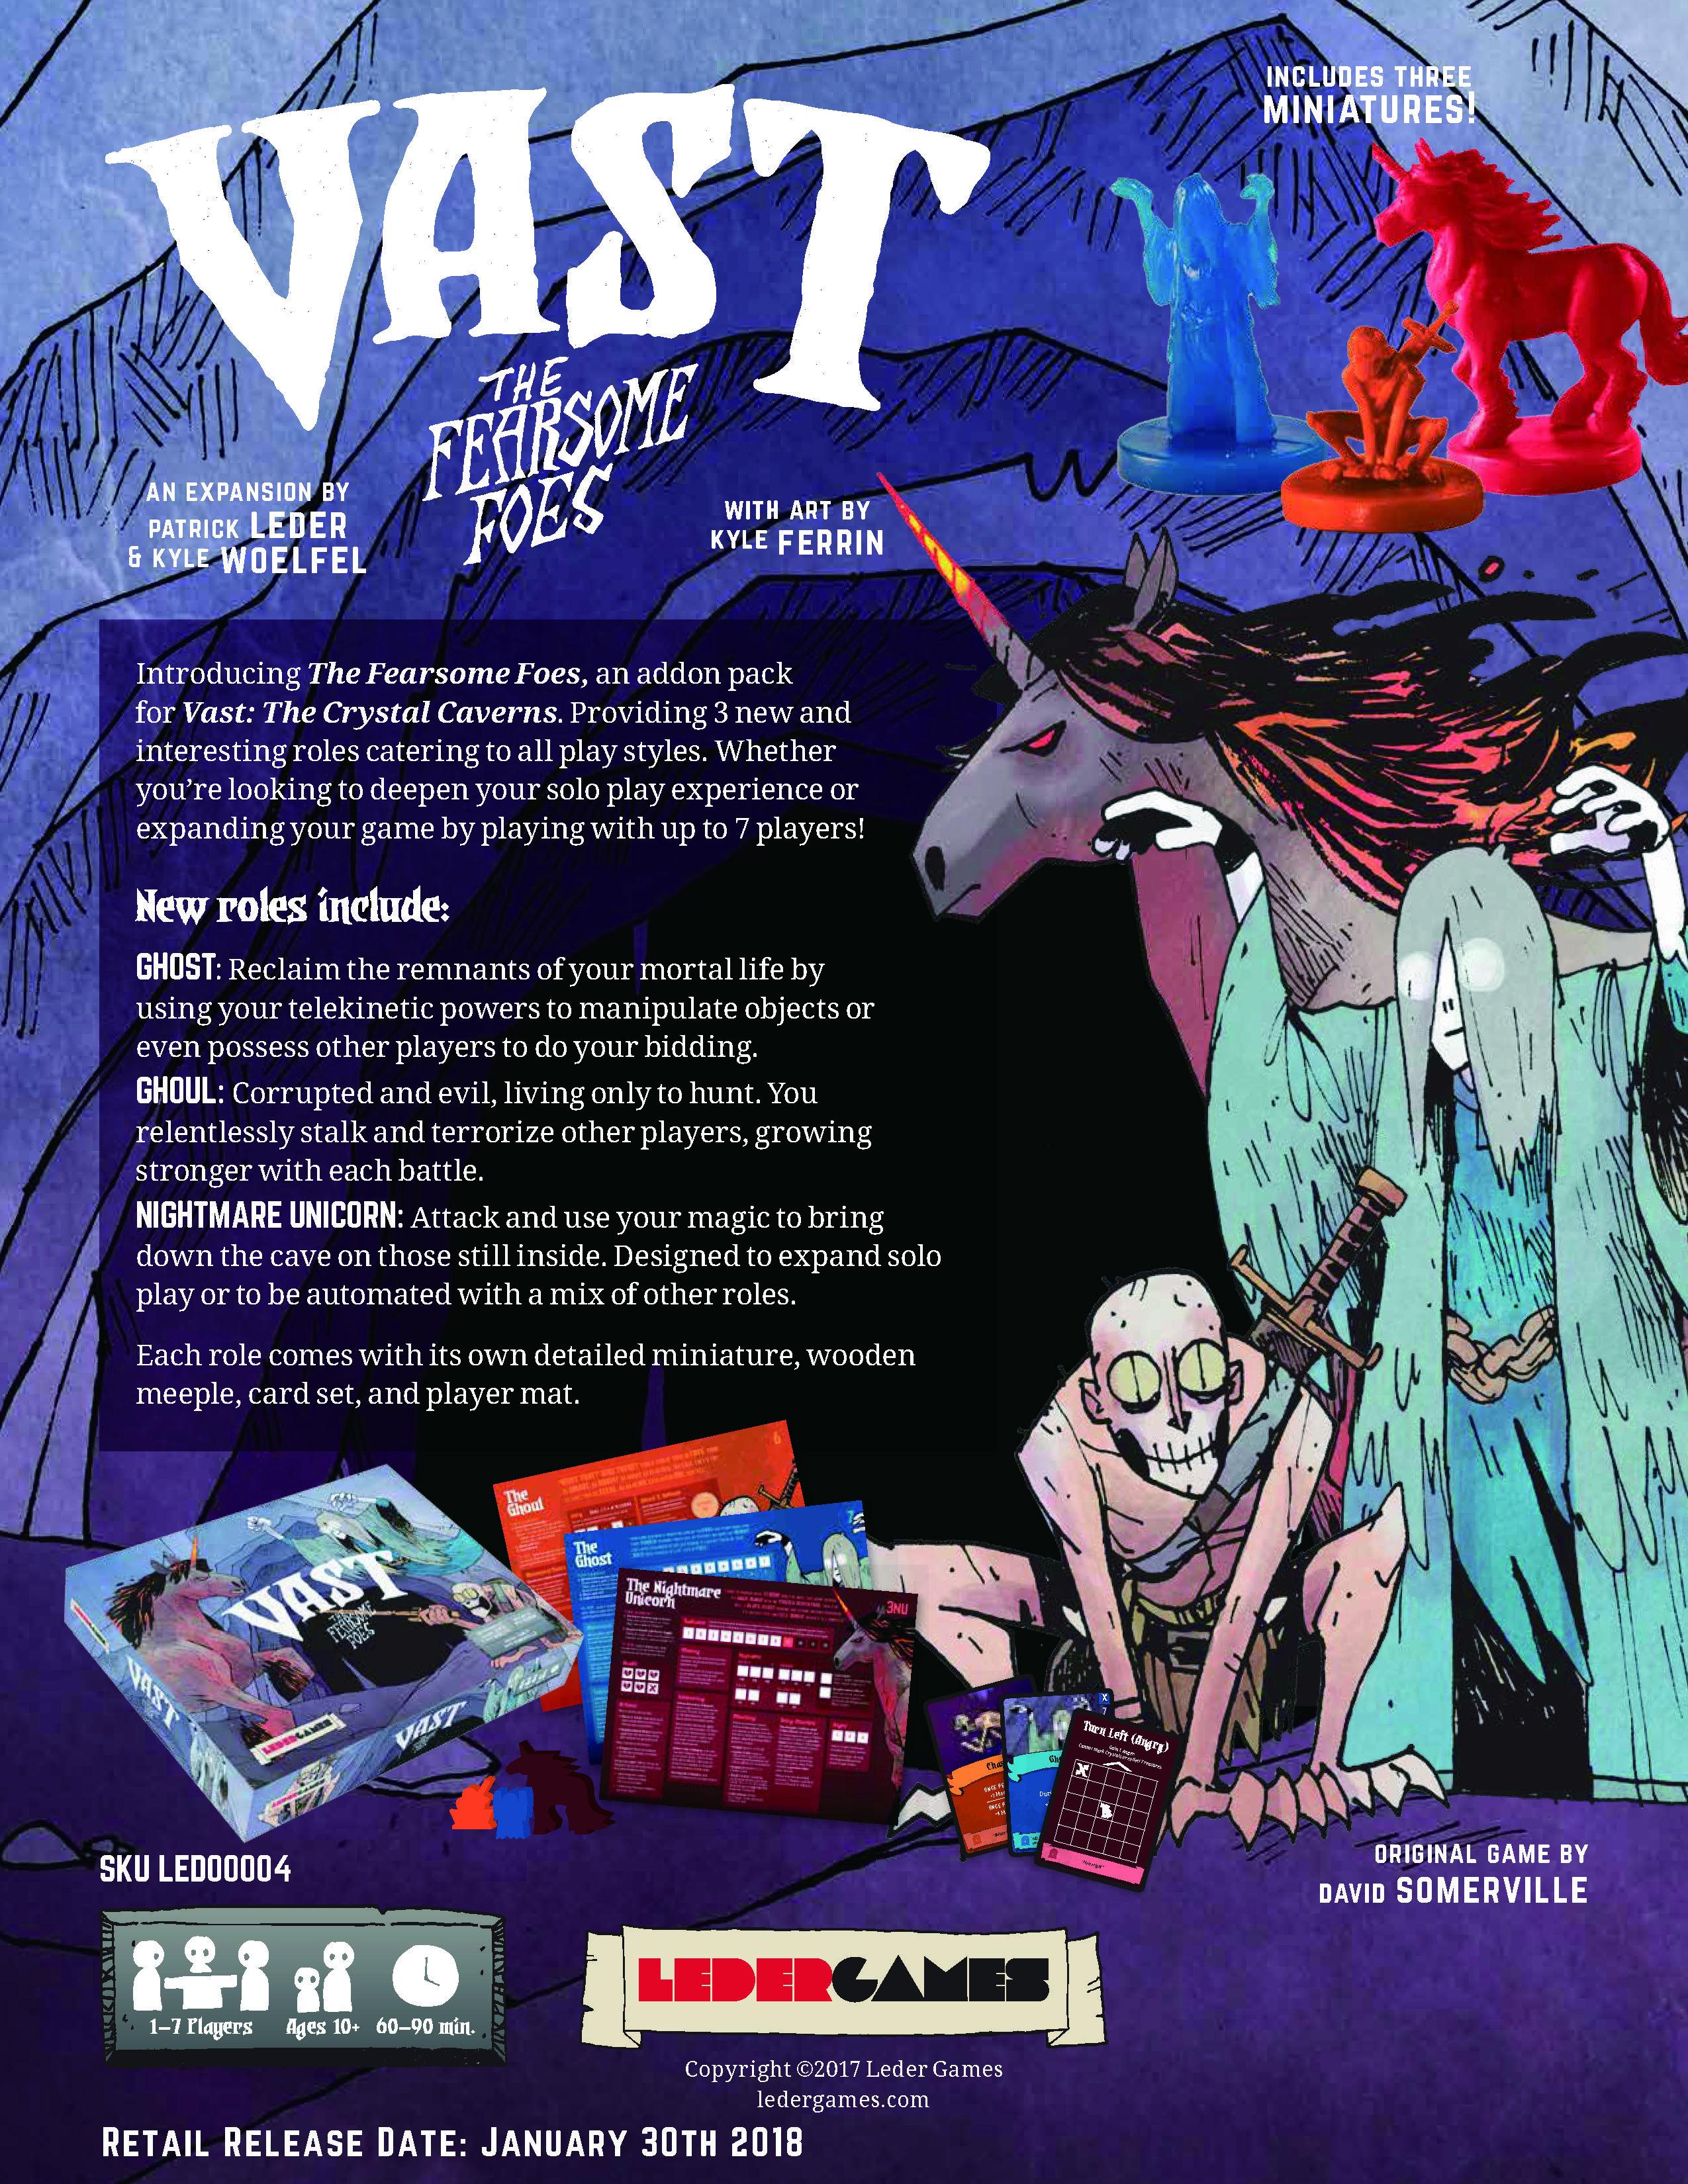 VAST拡張:The Fearsome Foes(日本語説明書・シール付き予定)